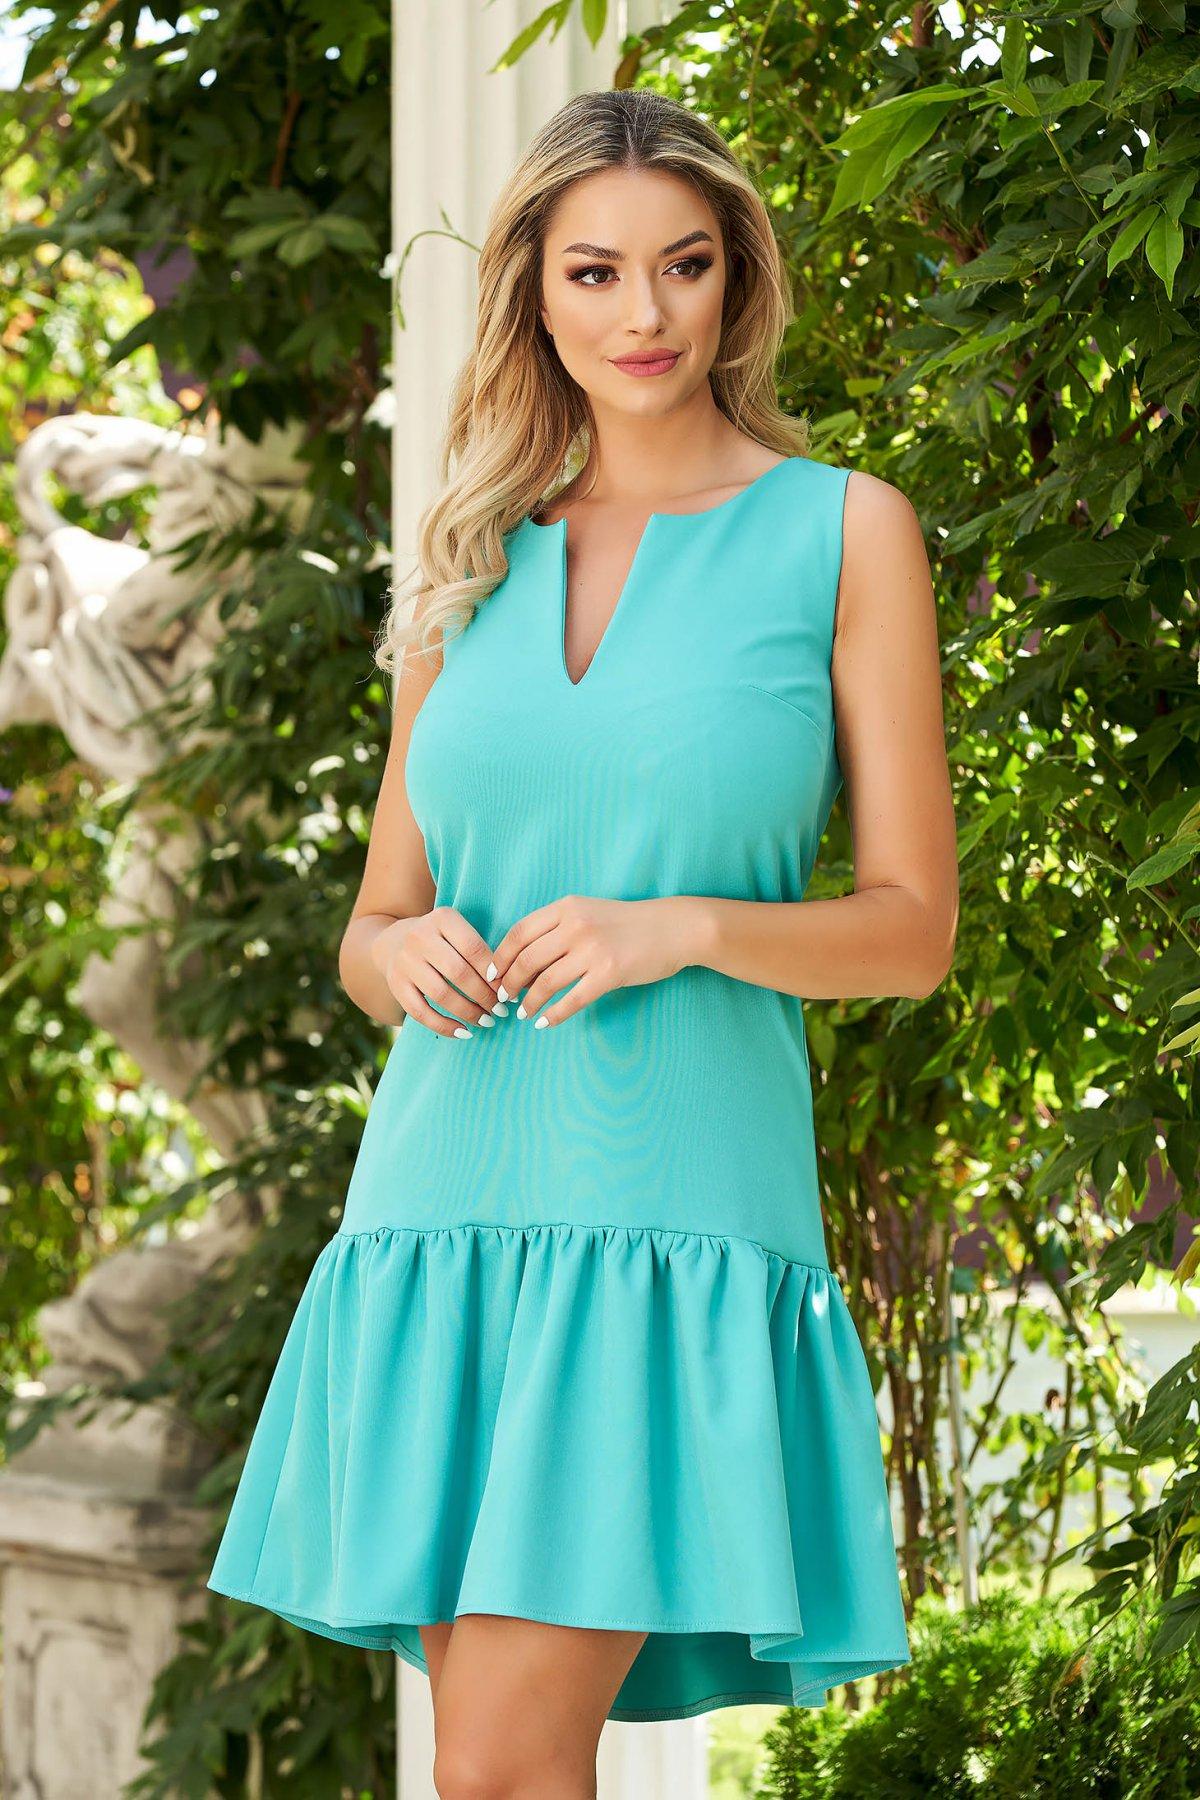 Rochie StarShinerS verde de zi din stofa cu croi larg cu volanase la baza rochiei